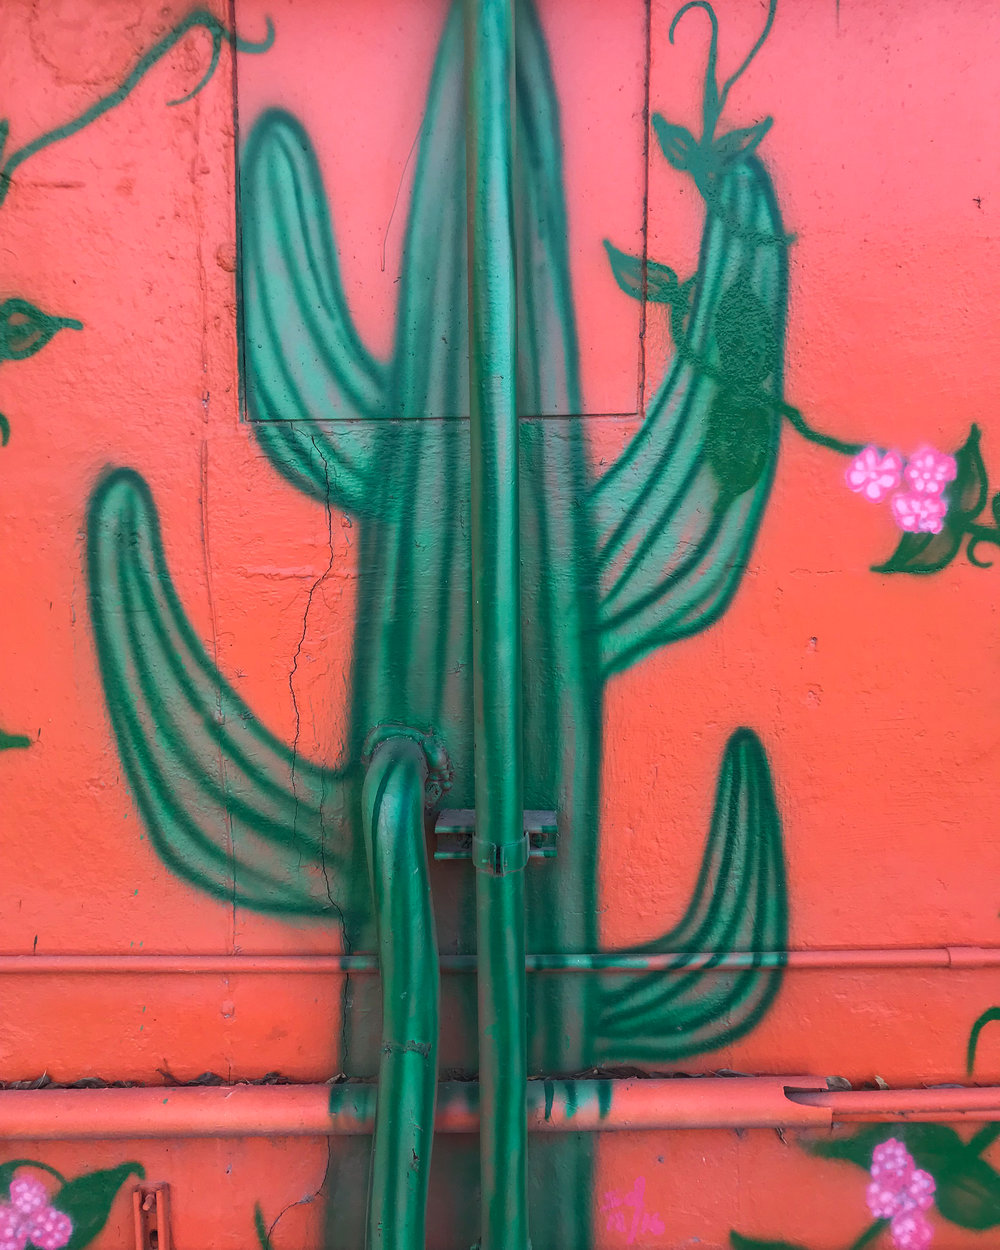 A cactus mural featured on the storefront of El Secreto de La Abuela